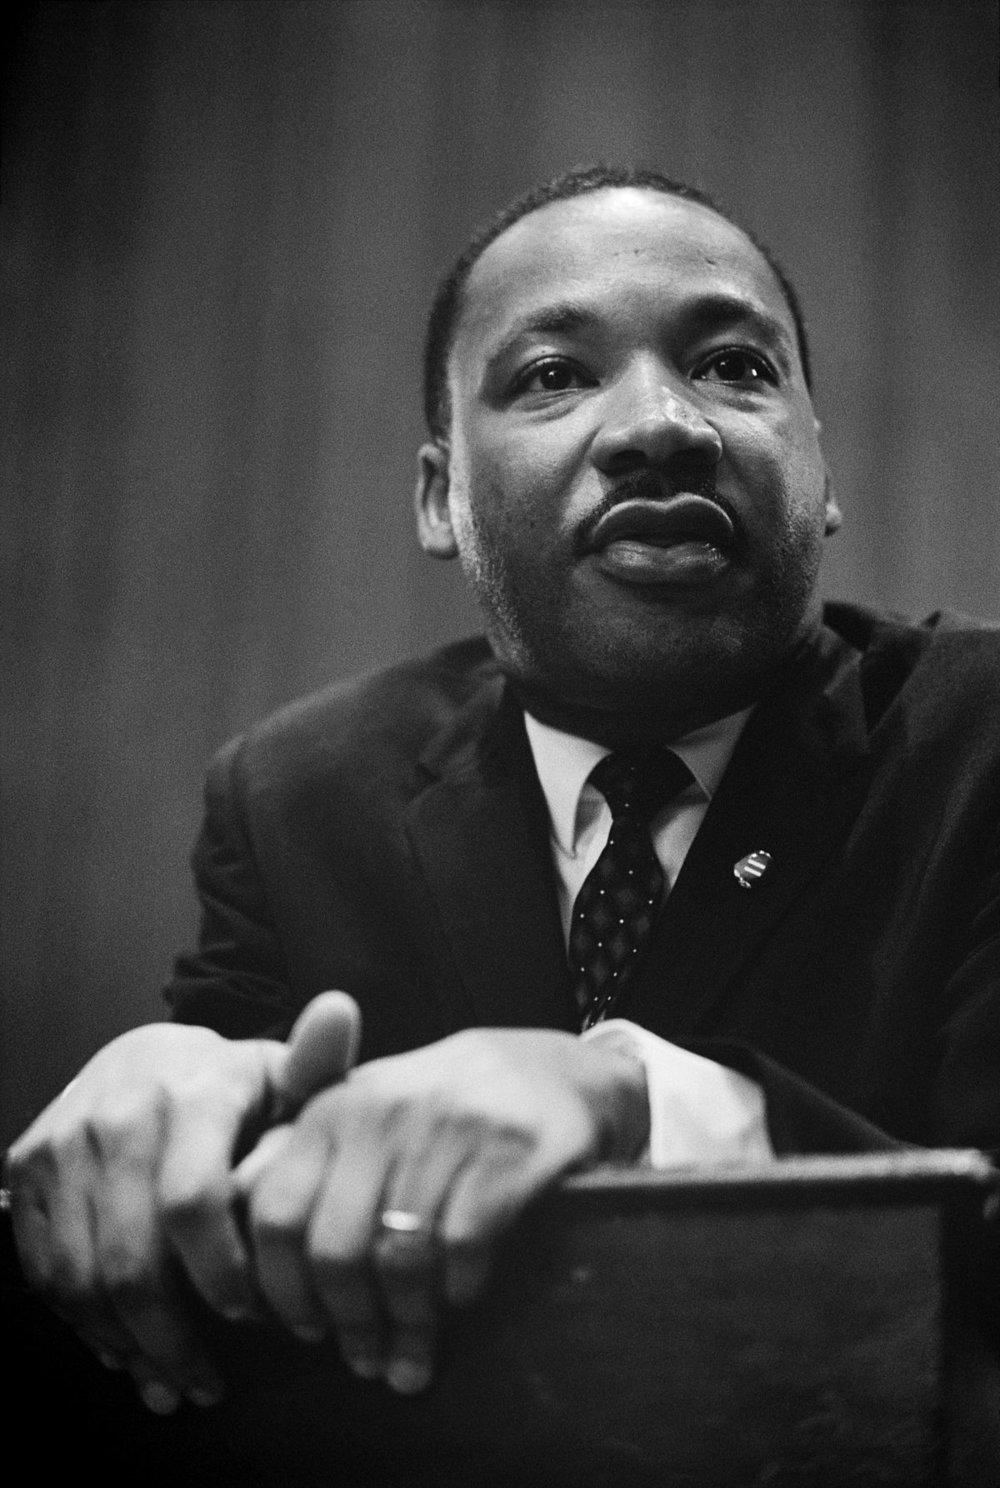 1200px-Martin_Luther_King_press_conference_01269u_edit.jpg